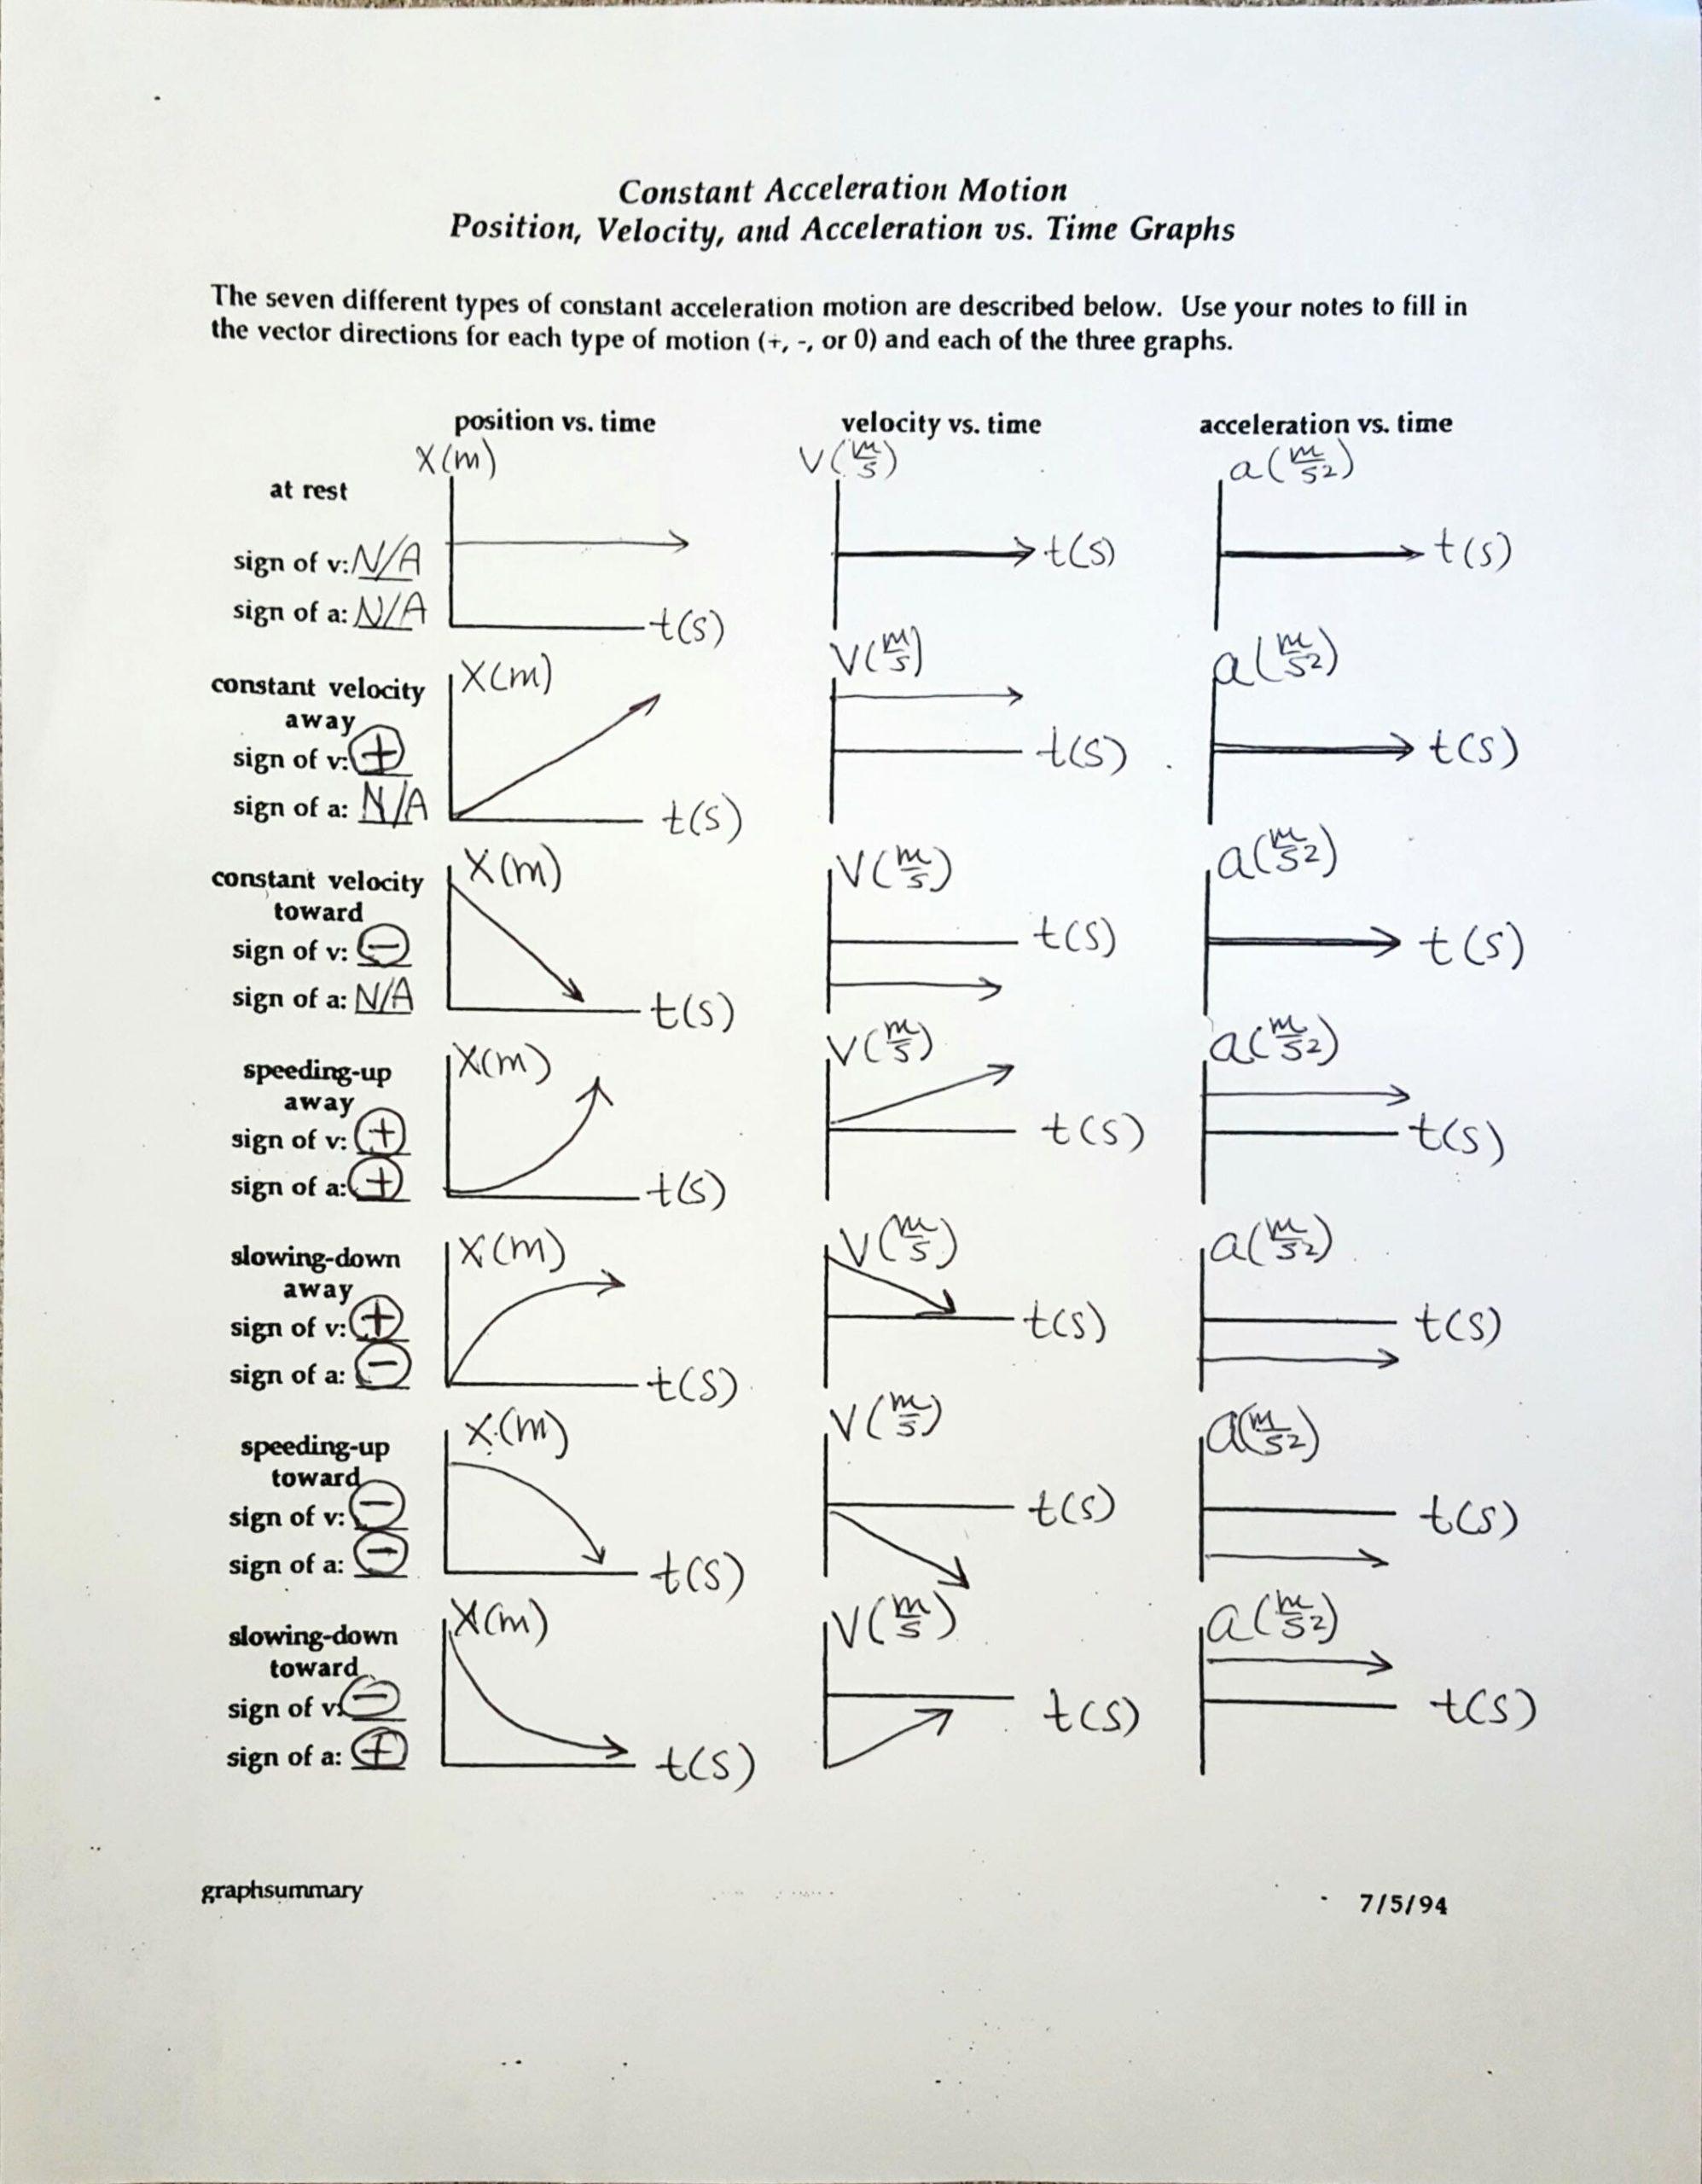 Motion Graphs Worksheet Answer Key Position and Velocity Vs Time Graphs Worksheet Answers